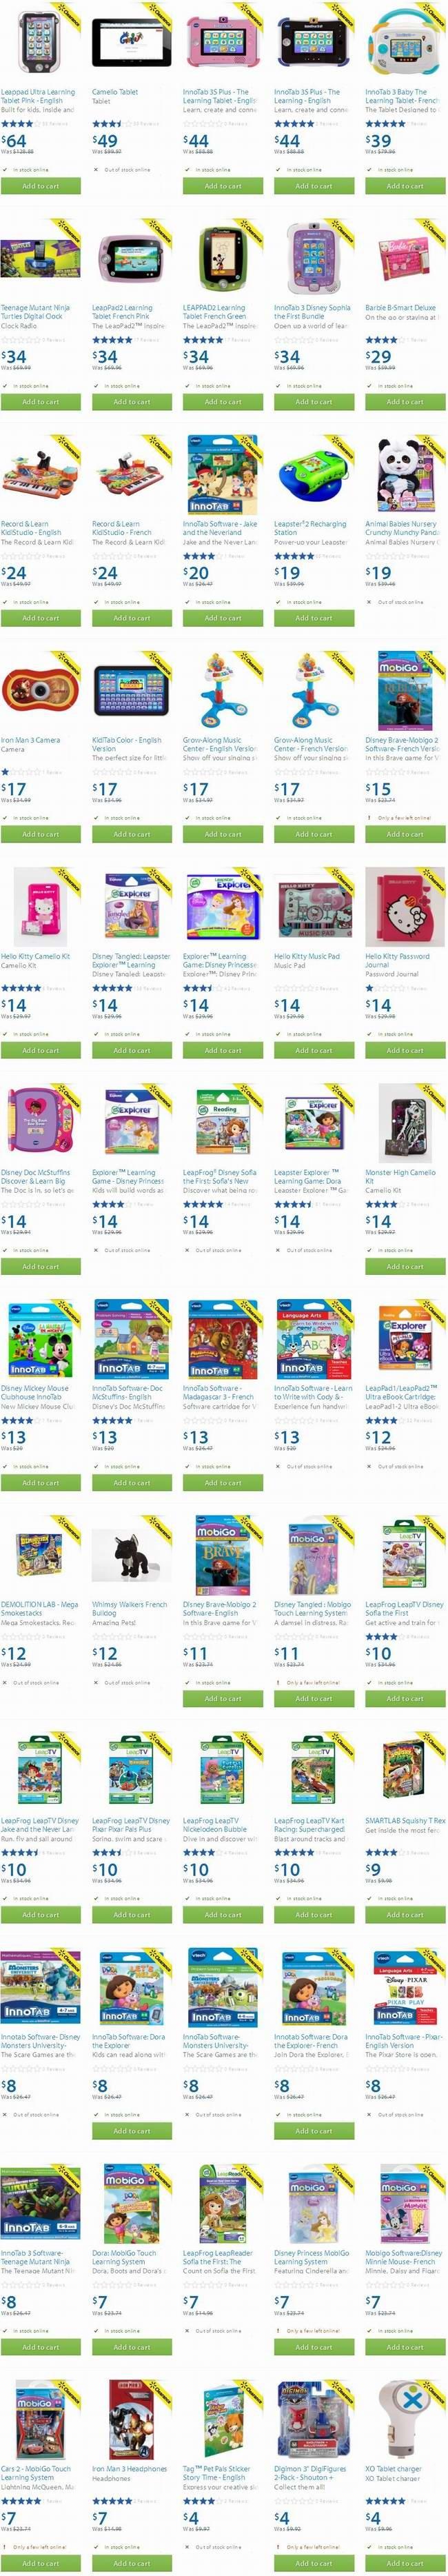 Walmart 数十款电子玩具、电子琴、儿童学习平板及软件2.5至5折清仓